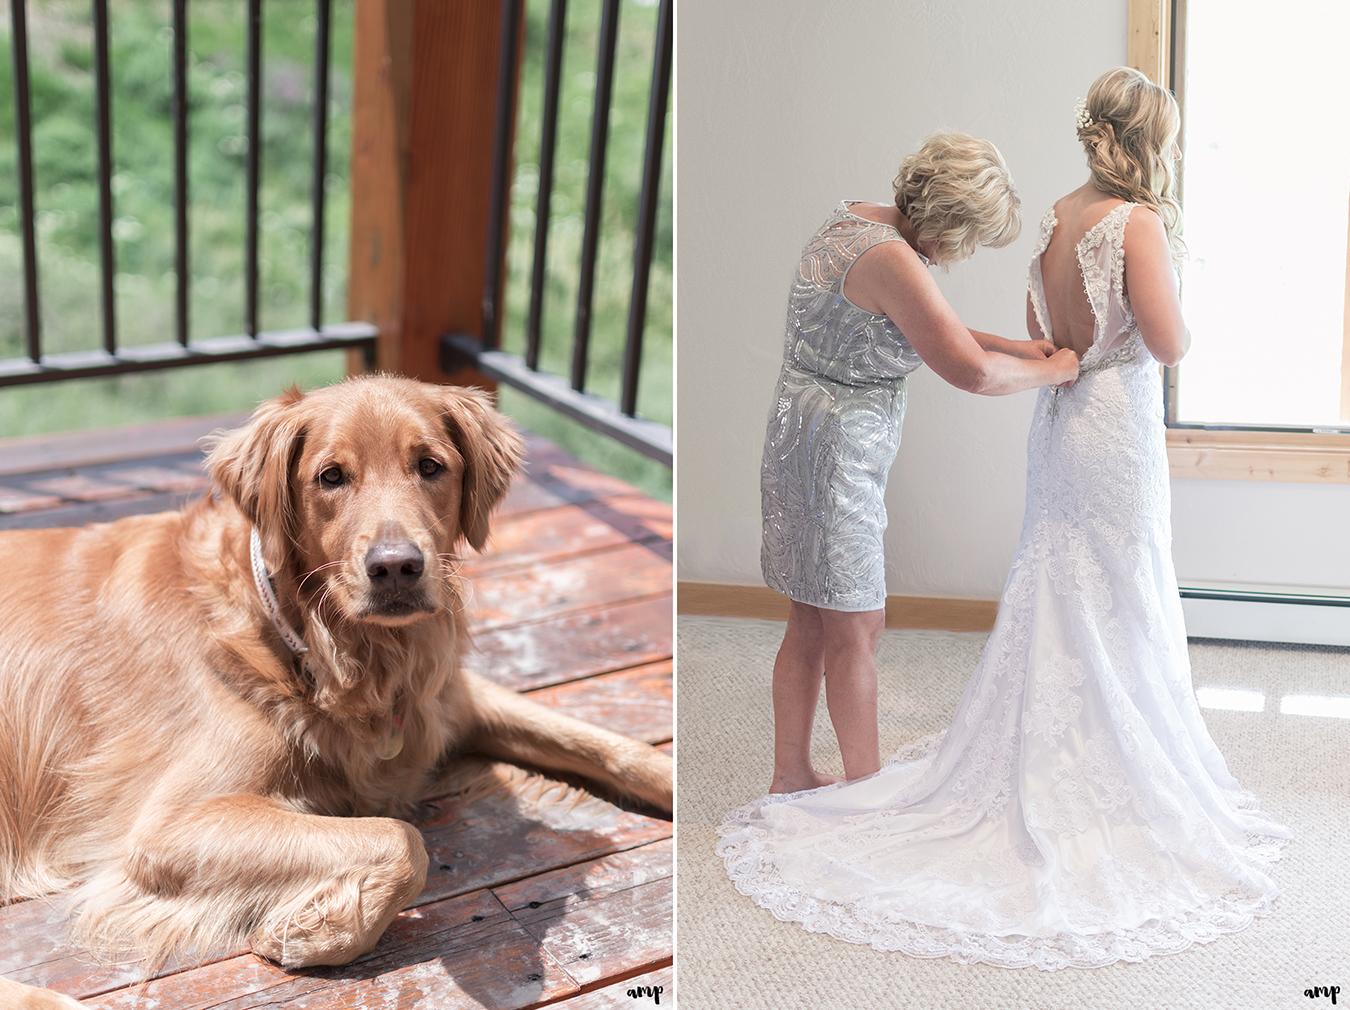 Mom doing up bride's dress